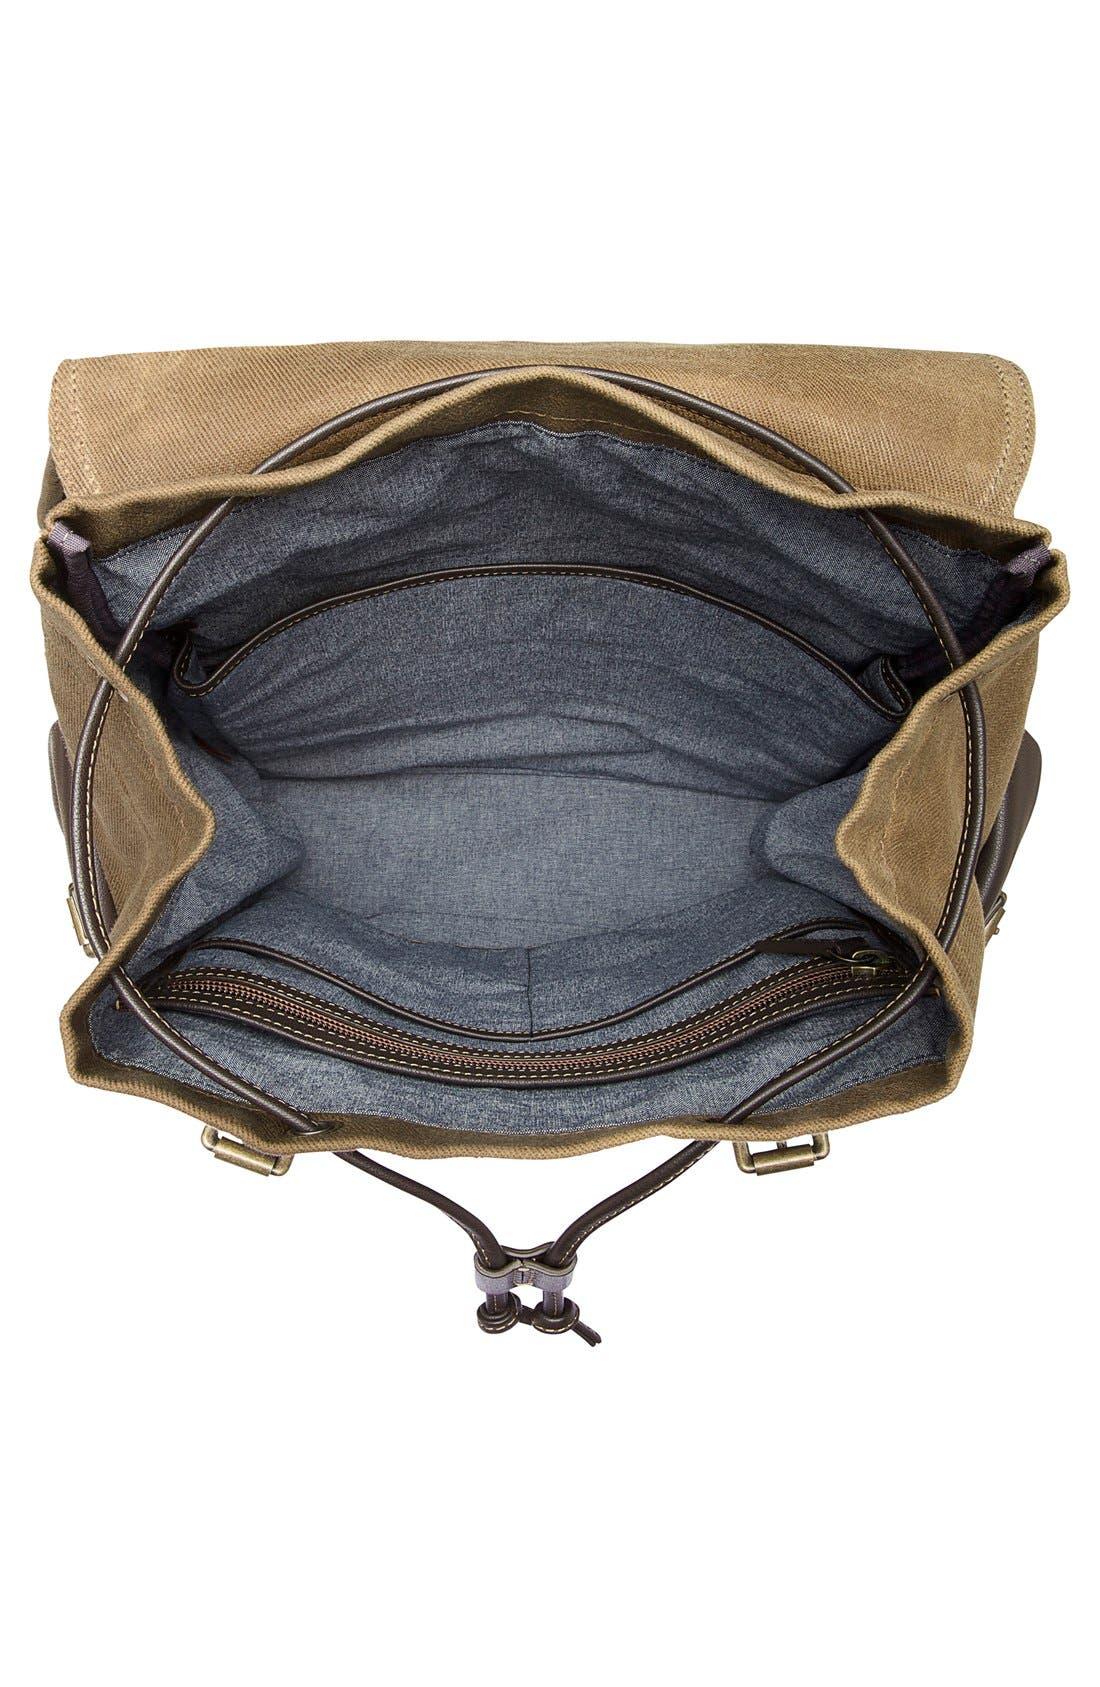 'Bridger' Waxed Canvas Backpack,                             Alternate thumbnail 2, color,                             Ranger Tan